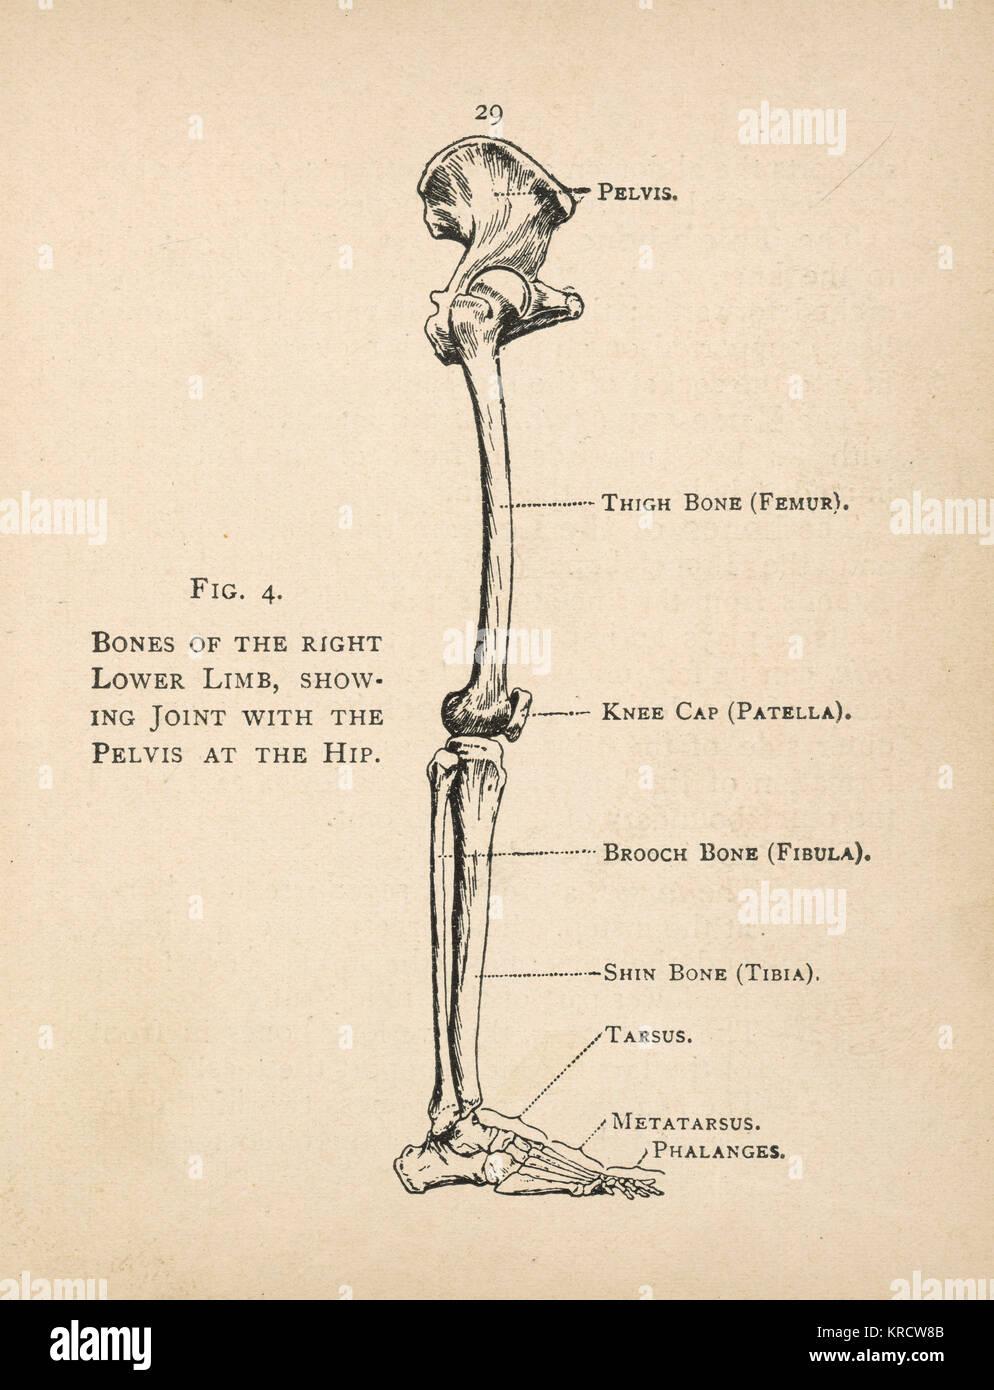 Human Femur Bone Imágenes De Stock & Human Femur Bone Fotos De Stock ...